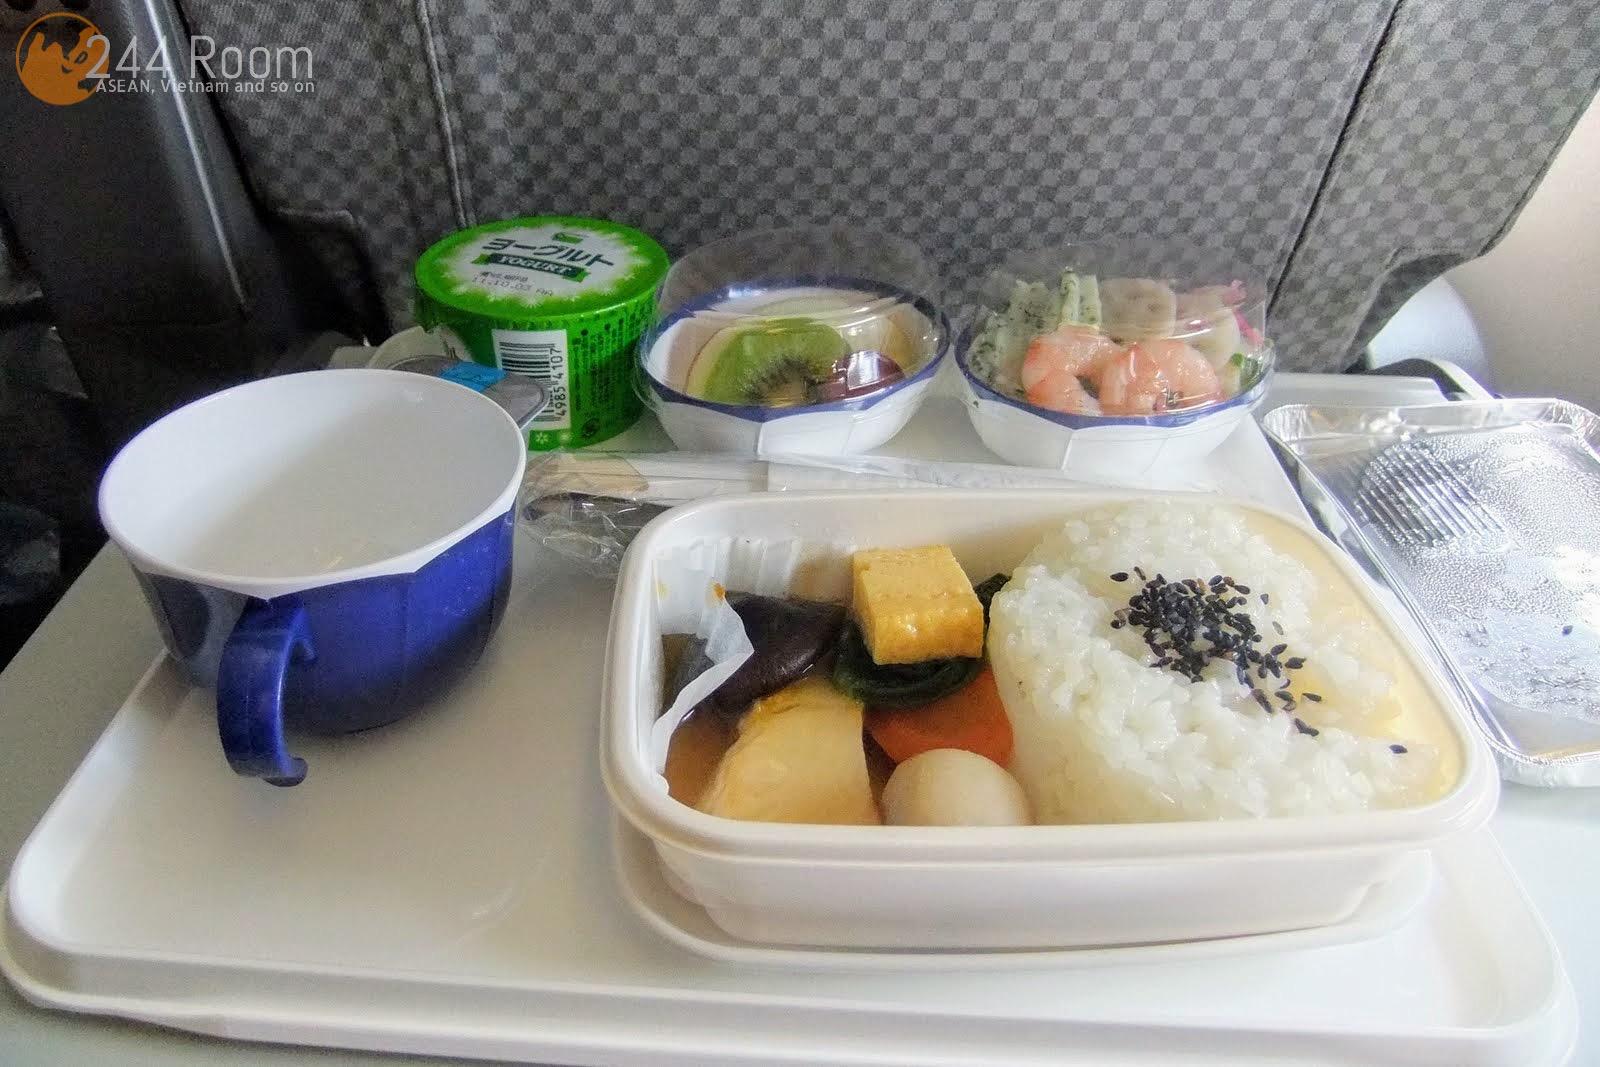 JAL Flight 002 meal 機内食